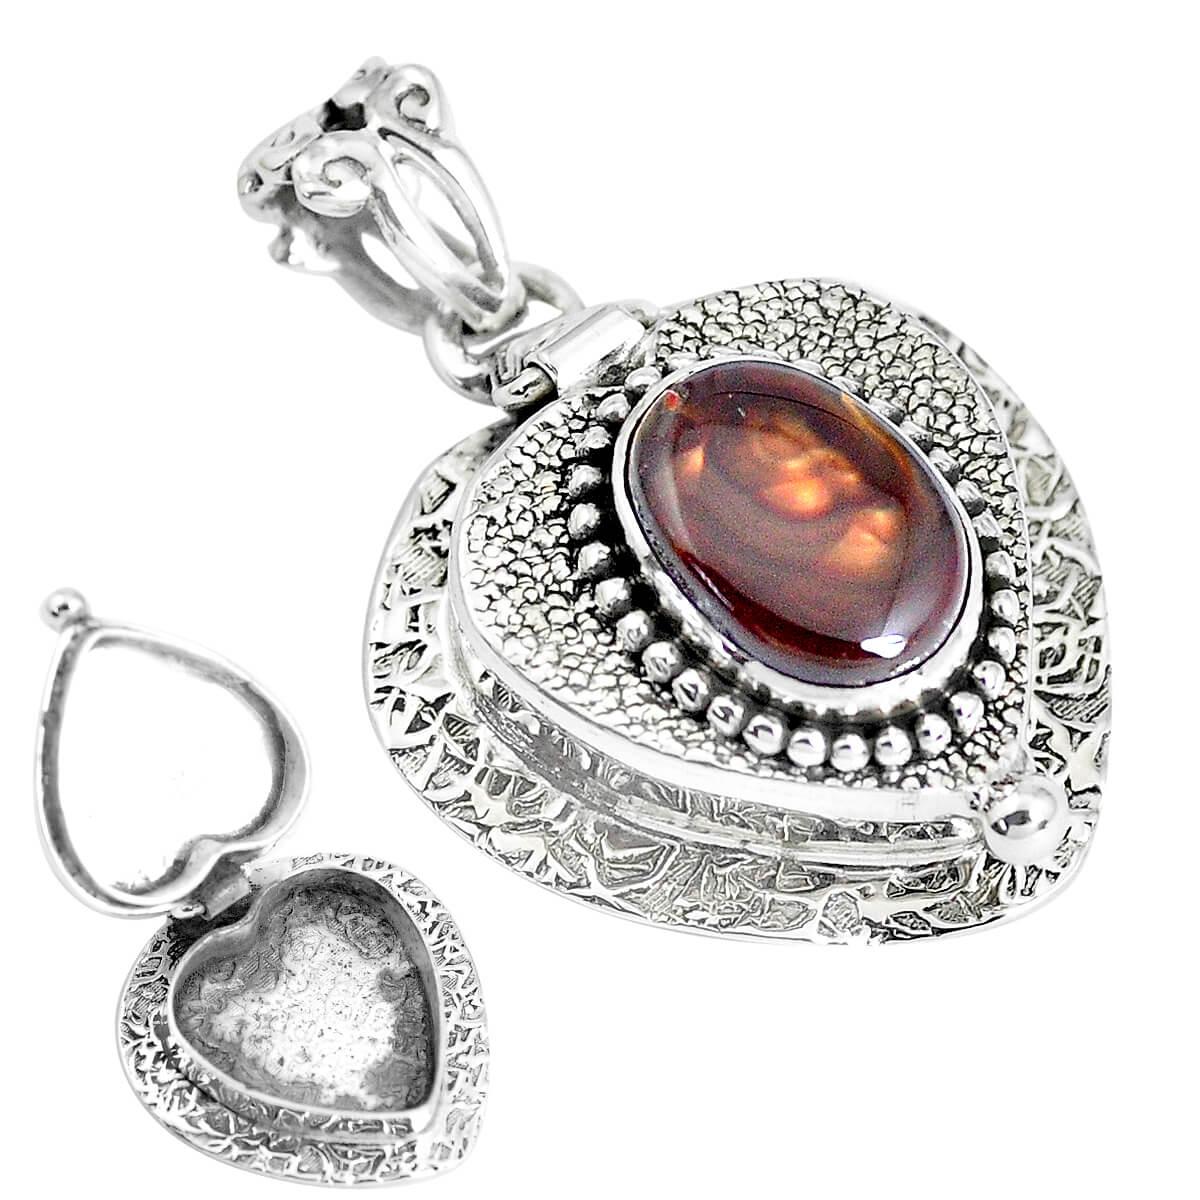 Sterling Silver Ammolite Secret Message Locket - 7.6 grams